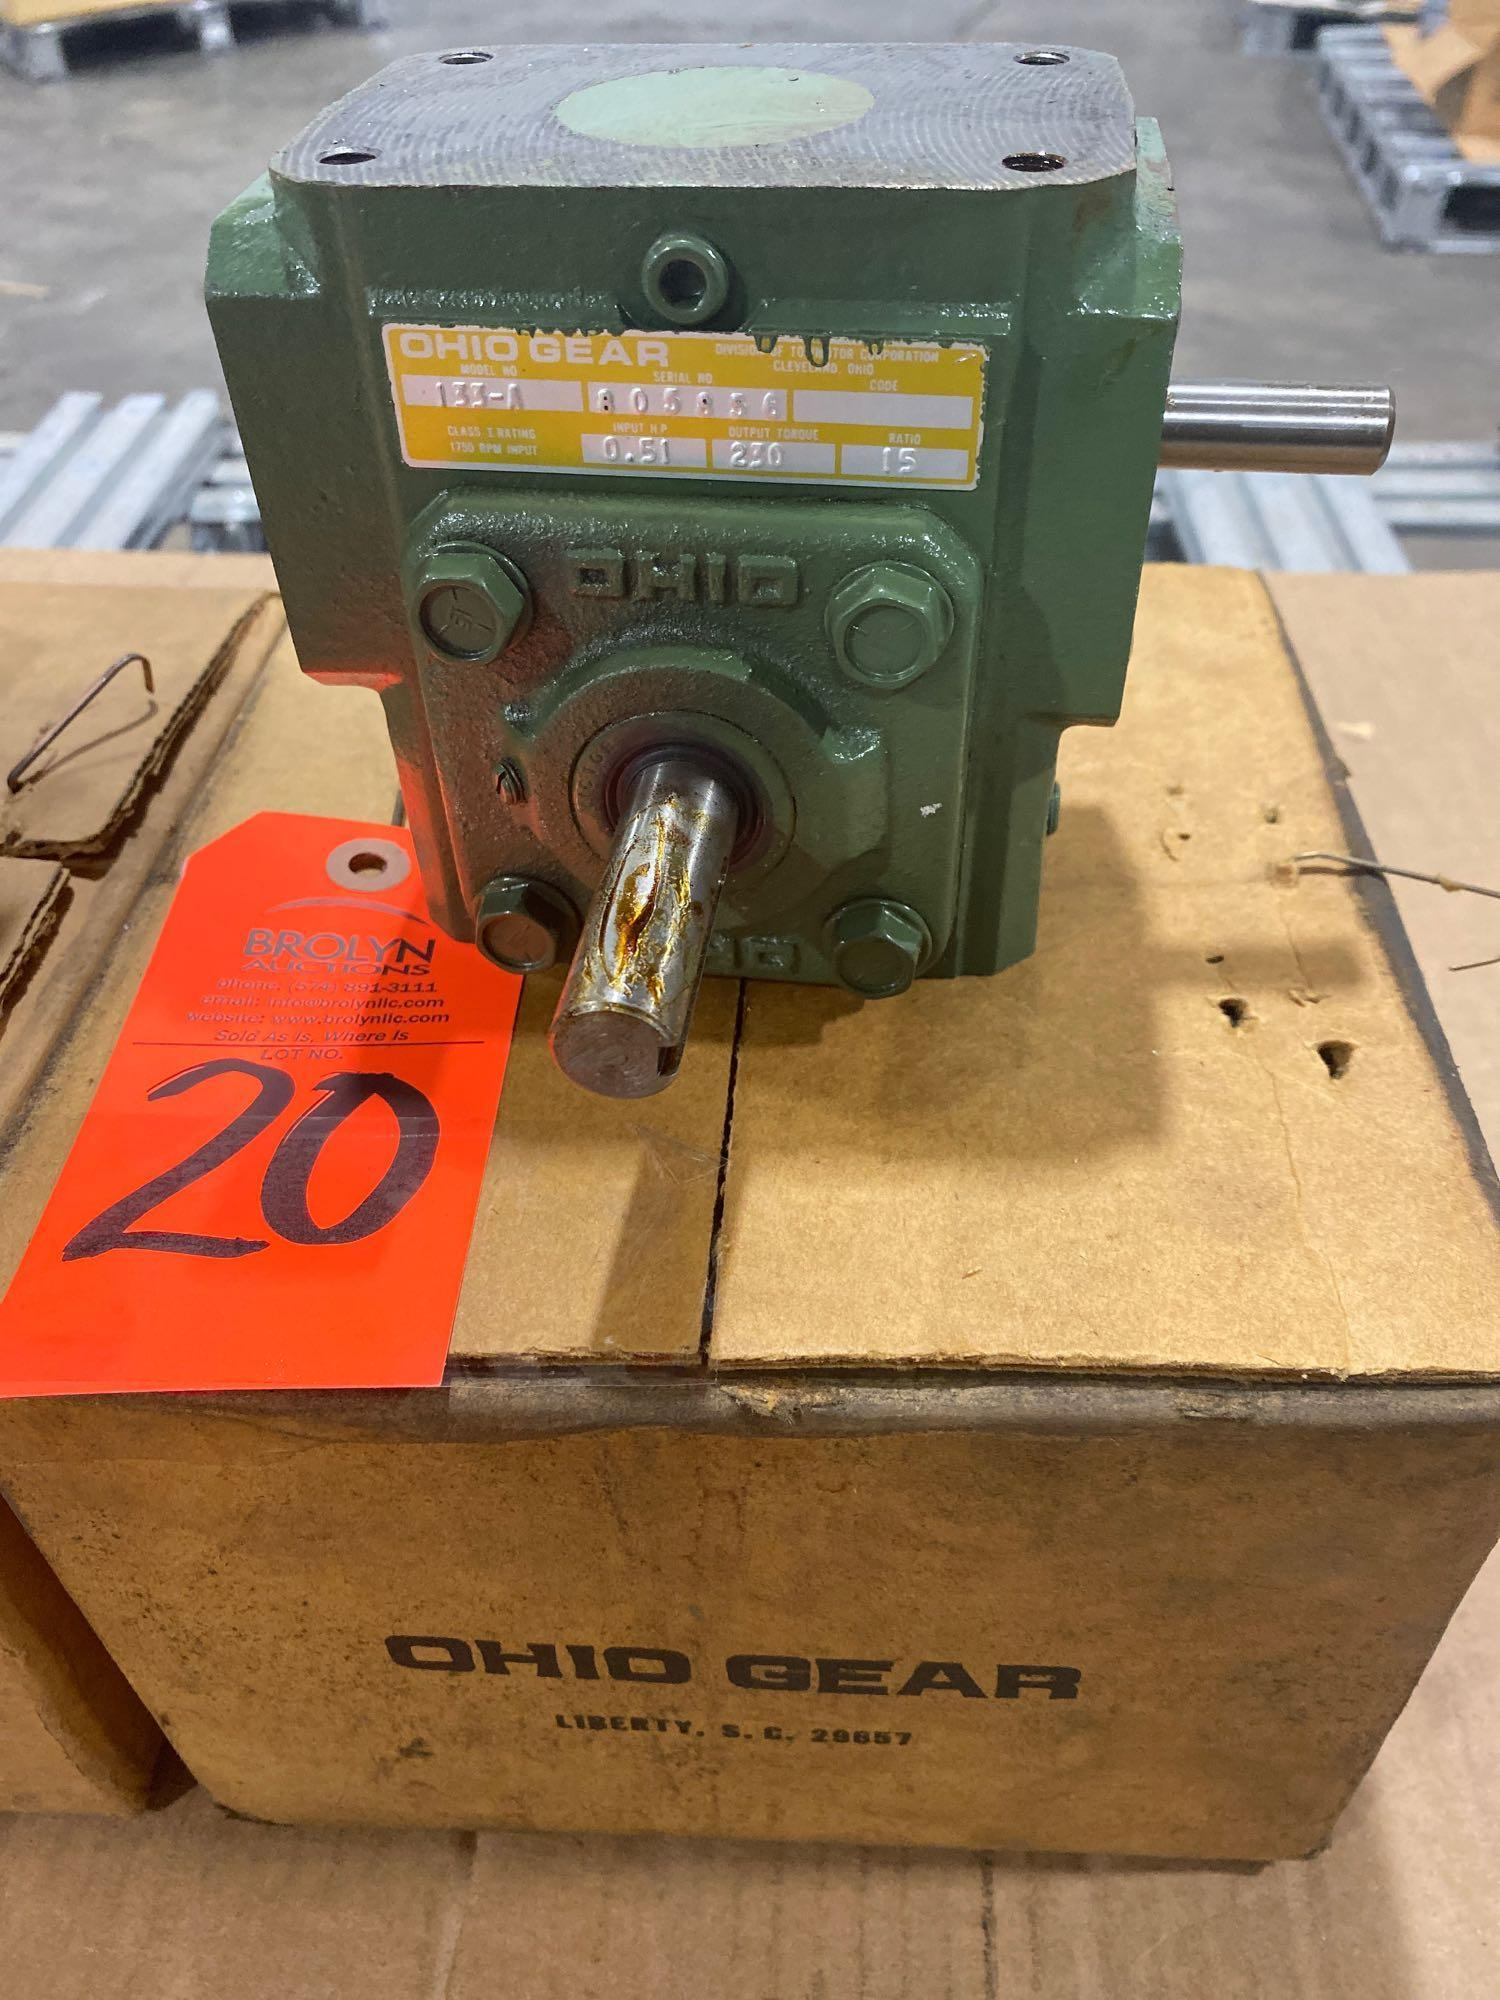 Lot 20 - Ohio Gear model 133-A gearbox. 15:1 ratio. New in box.